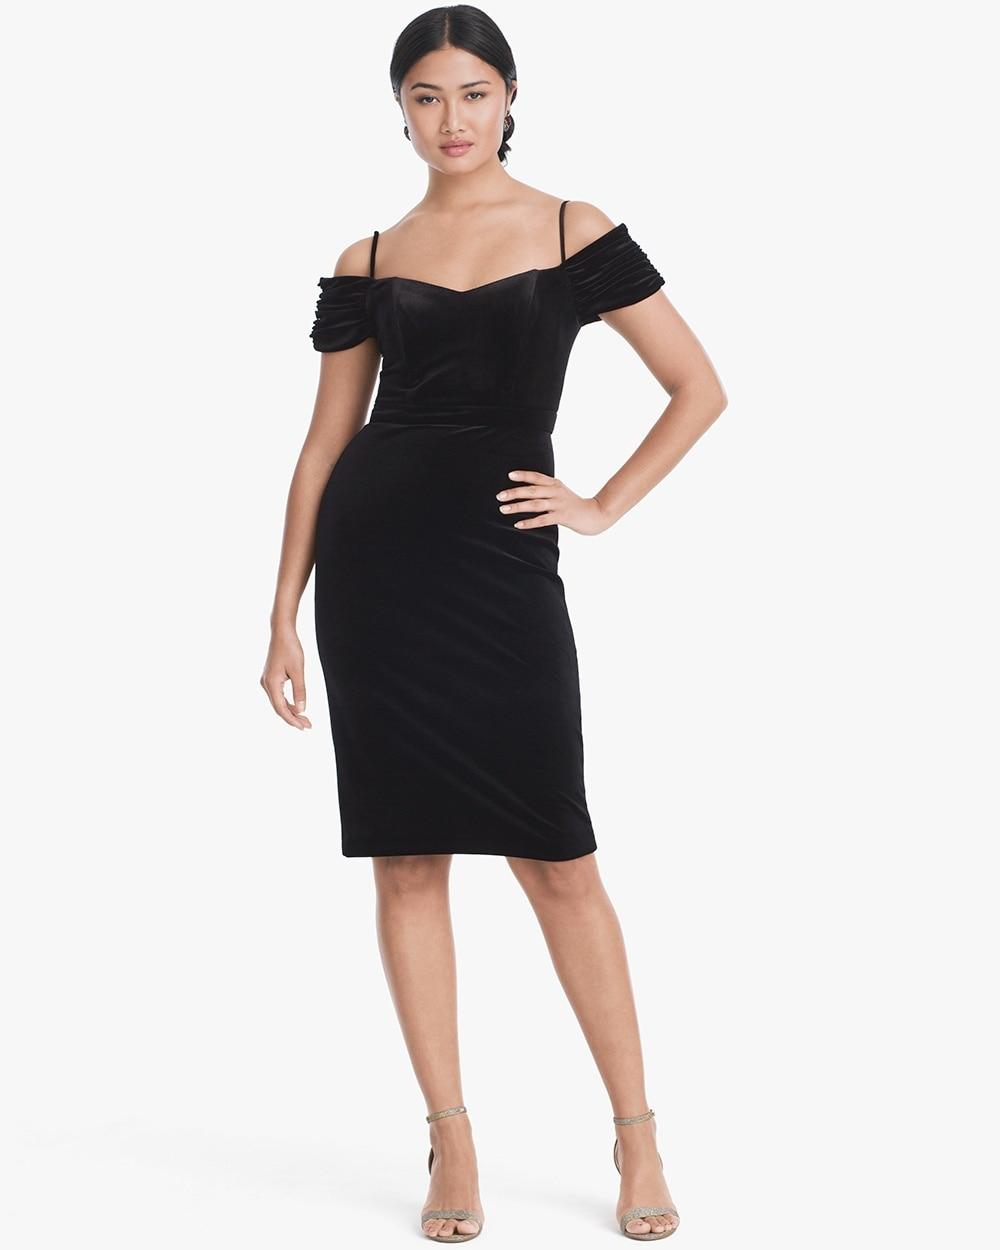 ccf6756f7ce10 Return to thumbnail image selection Off-the-Shoulder Velvet Sheath Dress  video preview image